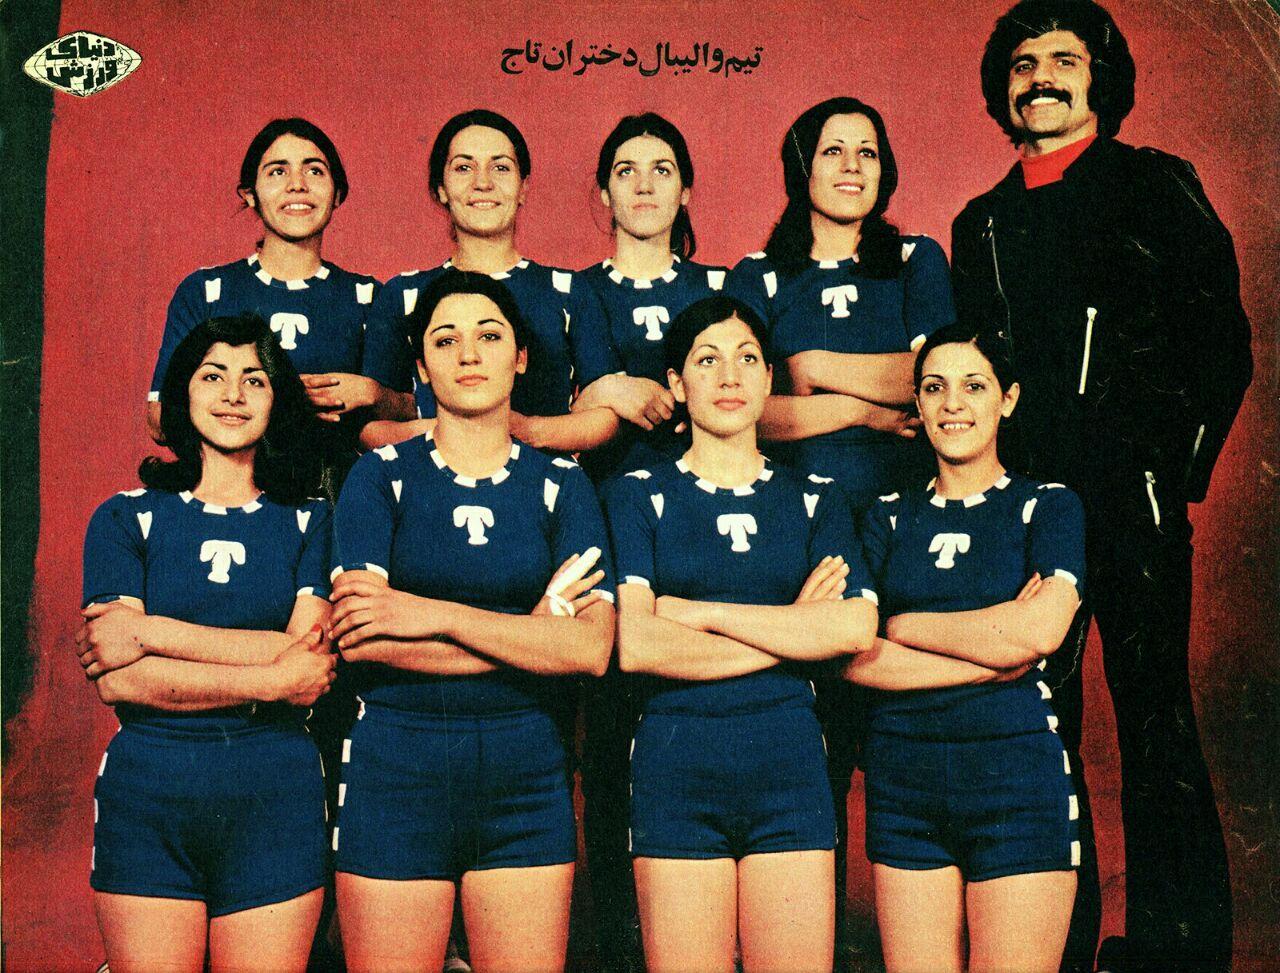 Photo Of The Iranian National Women S Volleyball League Circa 1970 S Tennis Players Female Girls Soccer Team Women S Handball